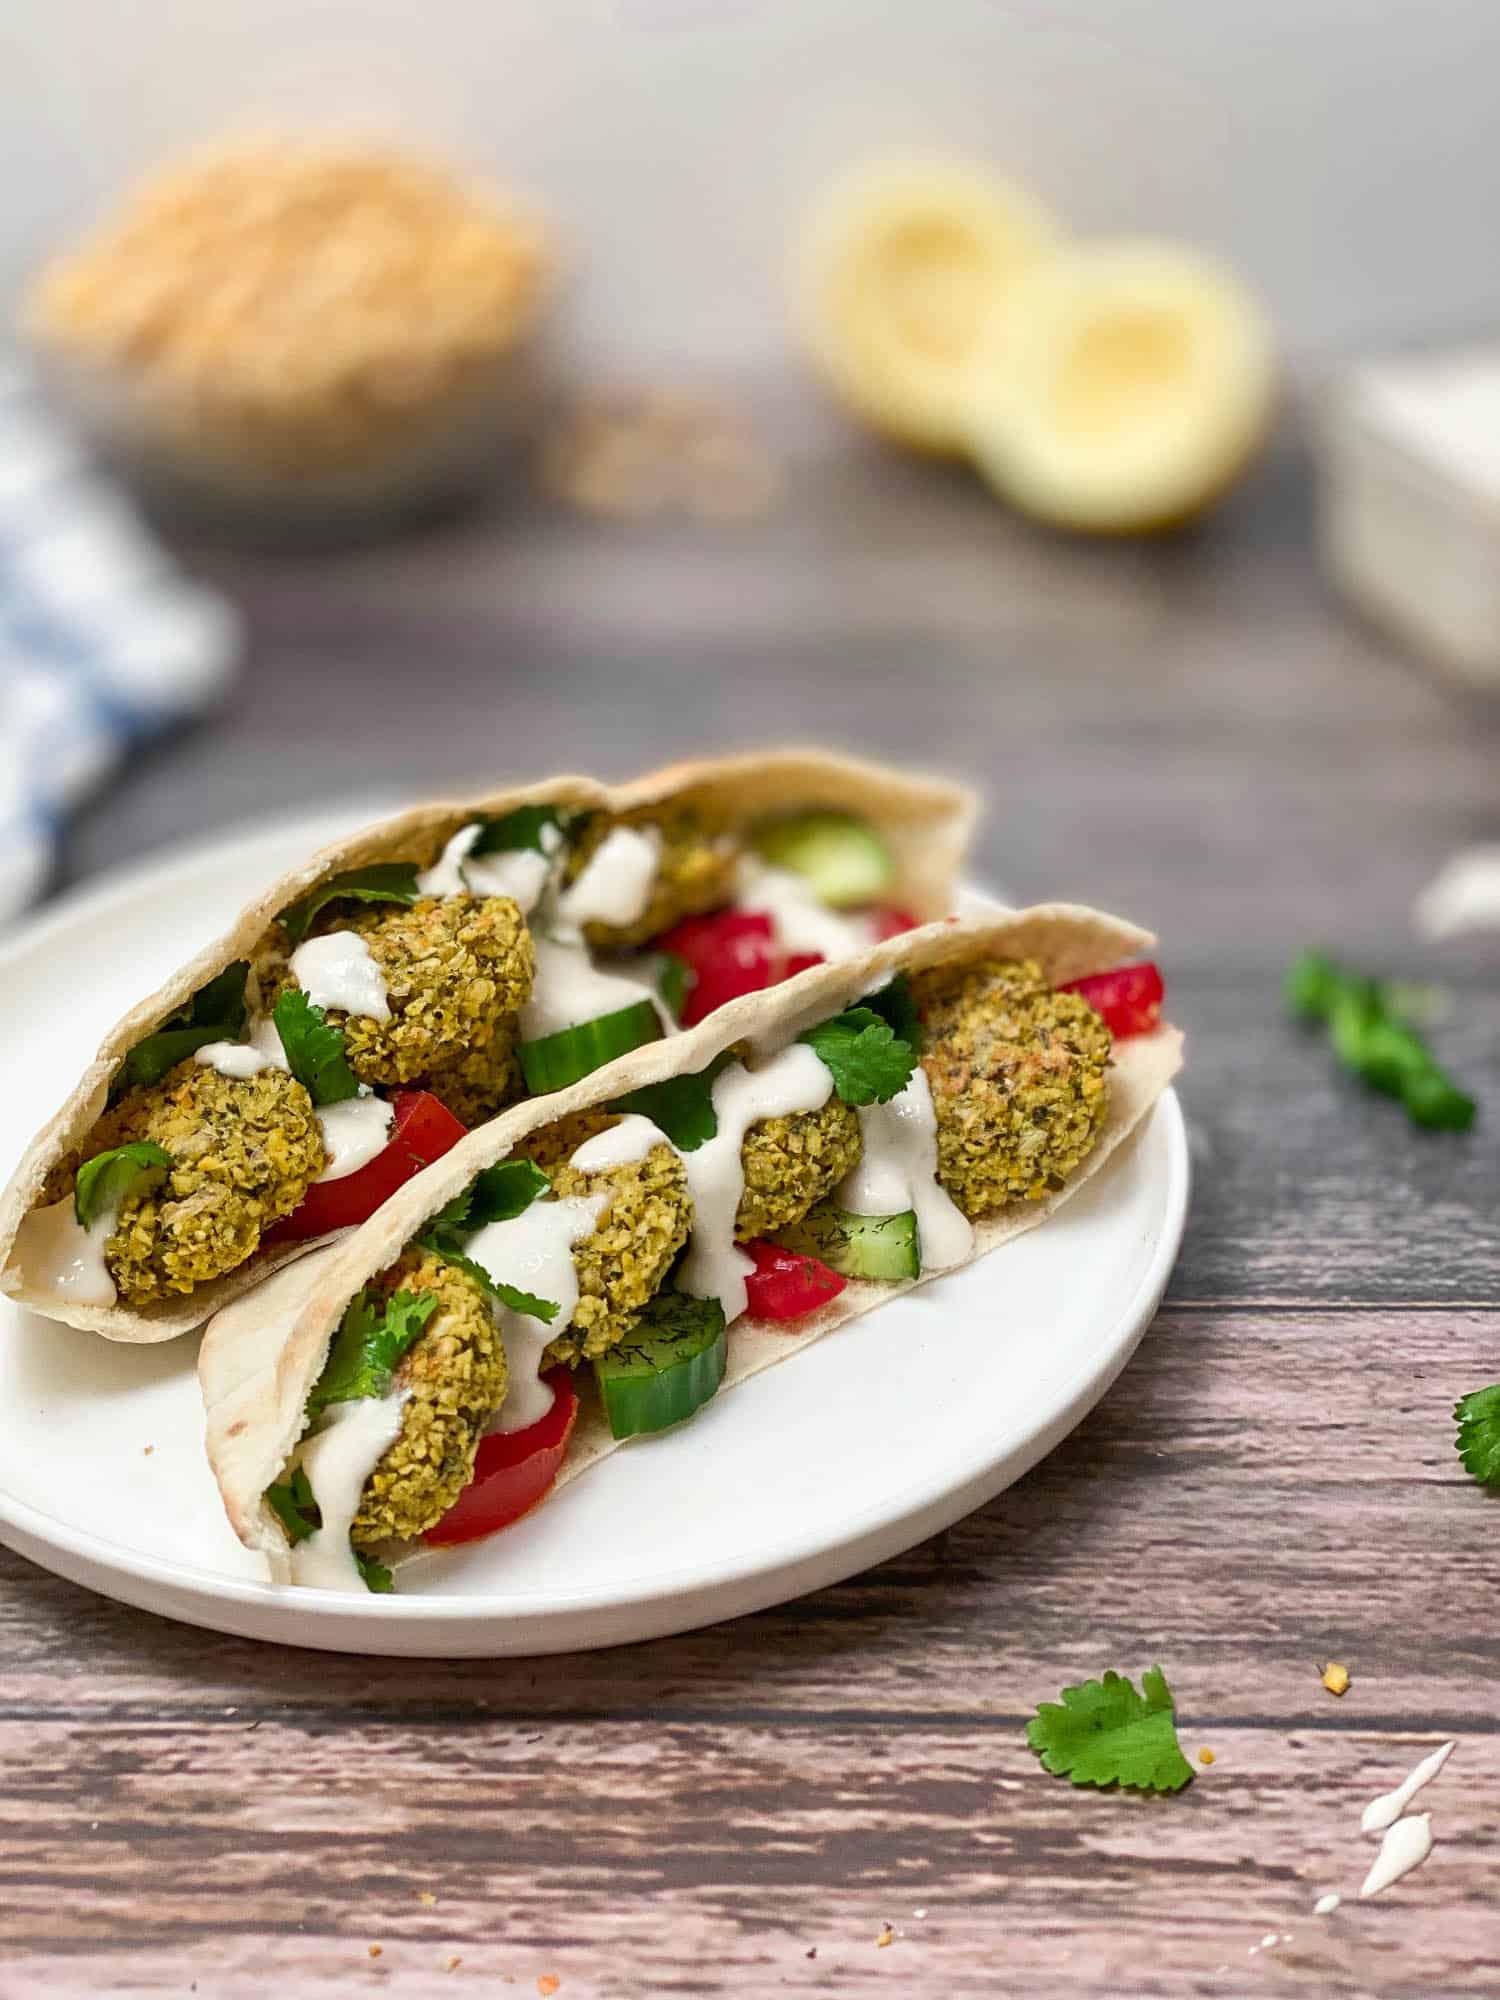 pita stuffed with falafel and creamy sauce